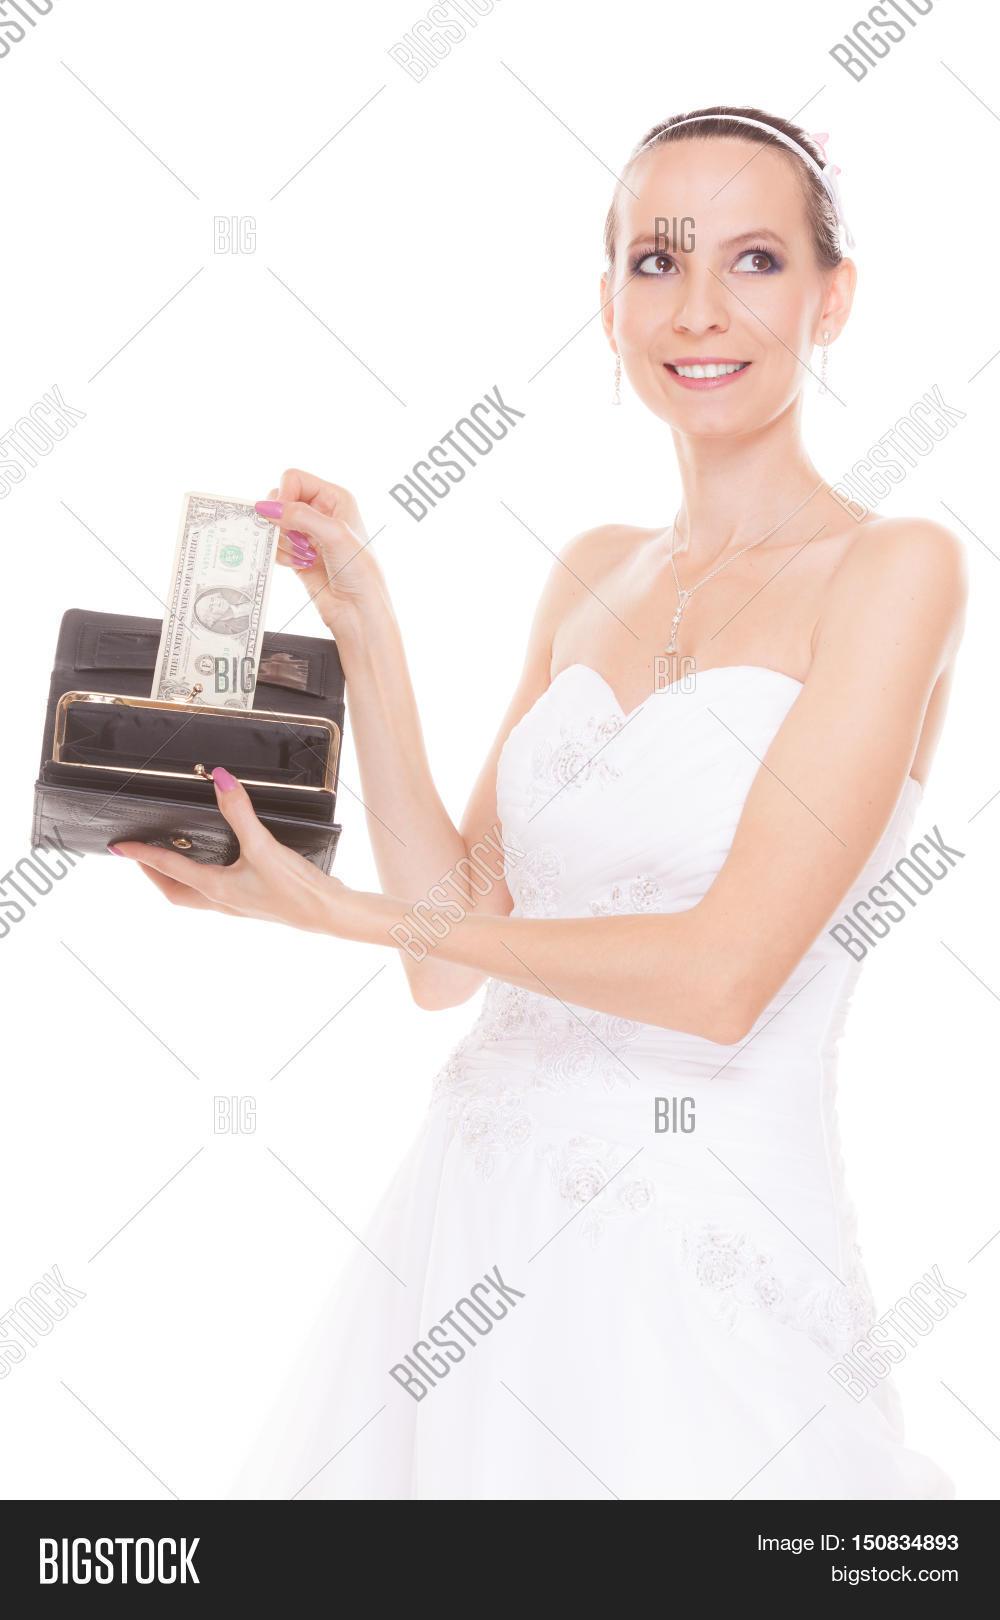 Bride One Dollar Image Photo Free Trial Bigstock